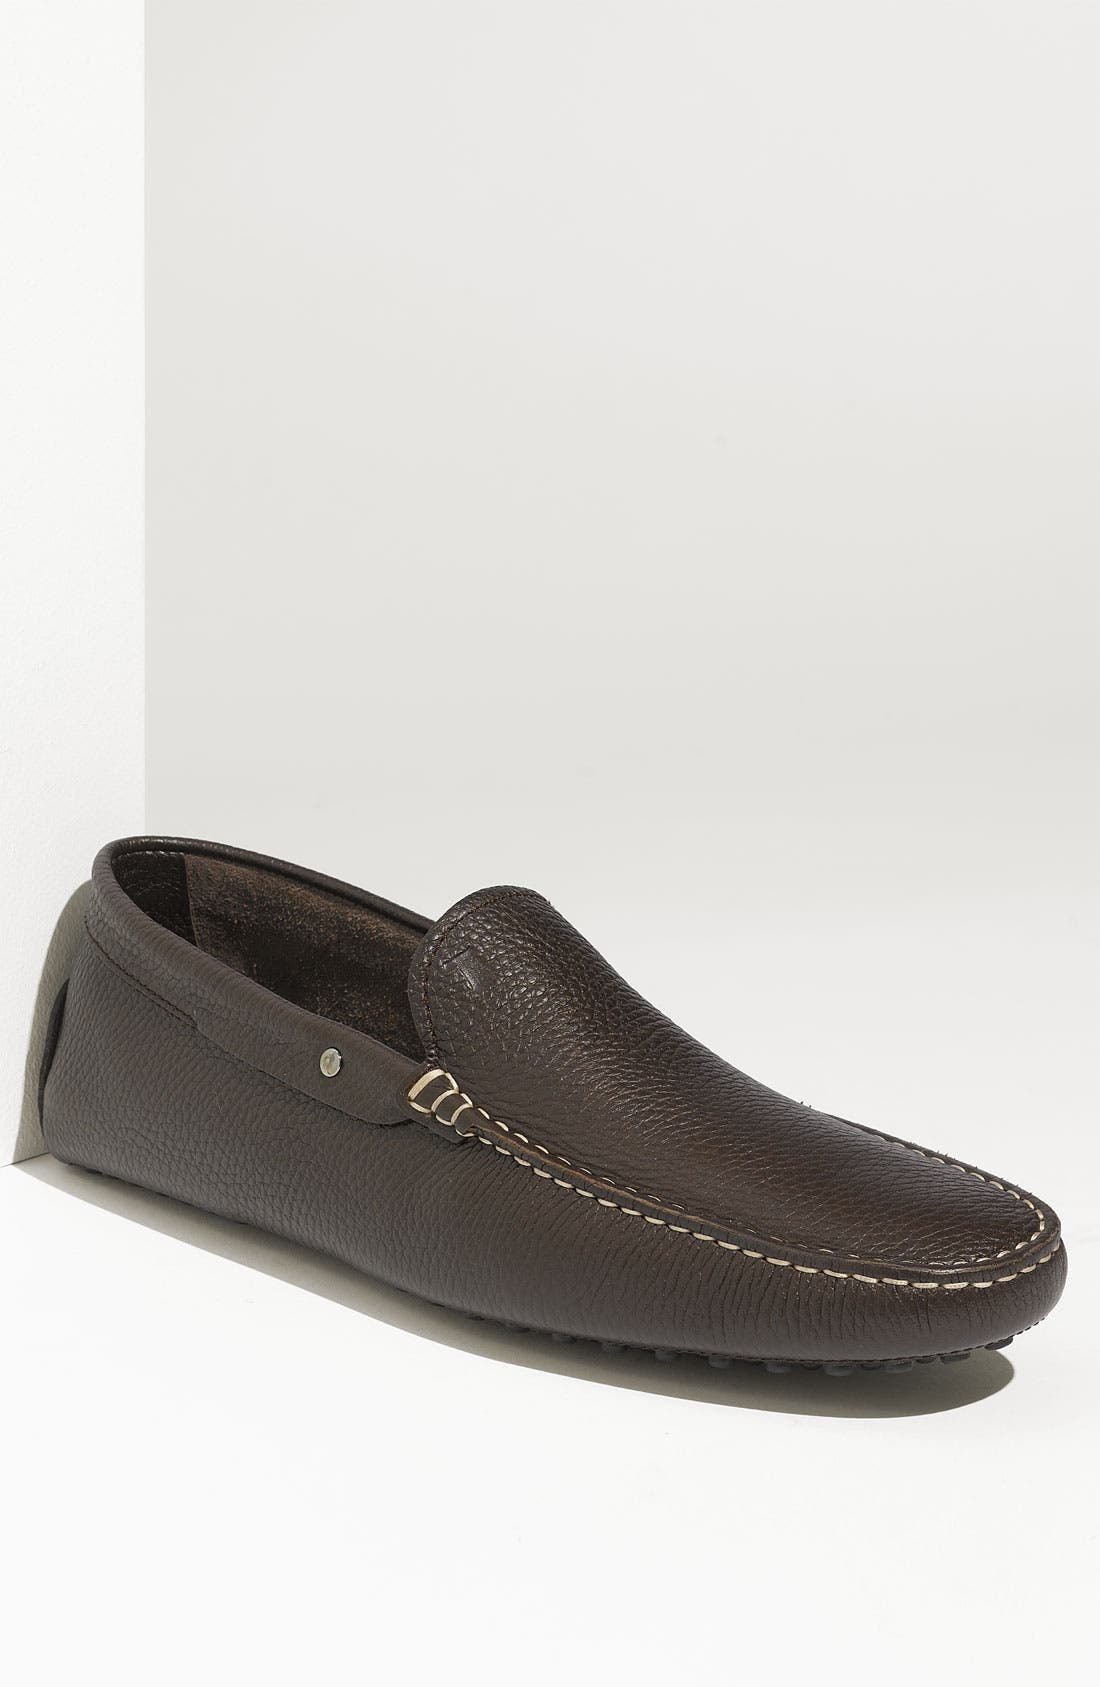 Alternate Image 1 Selected - Tod's 'Gommini' Driving Shoe